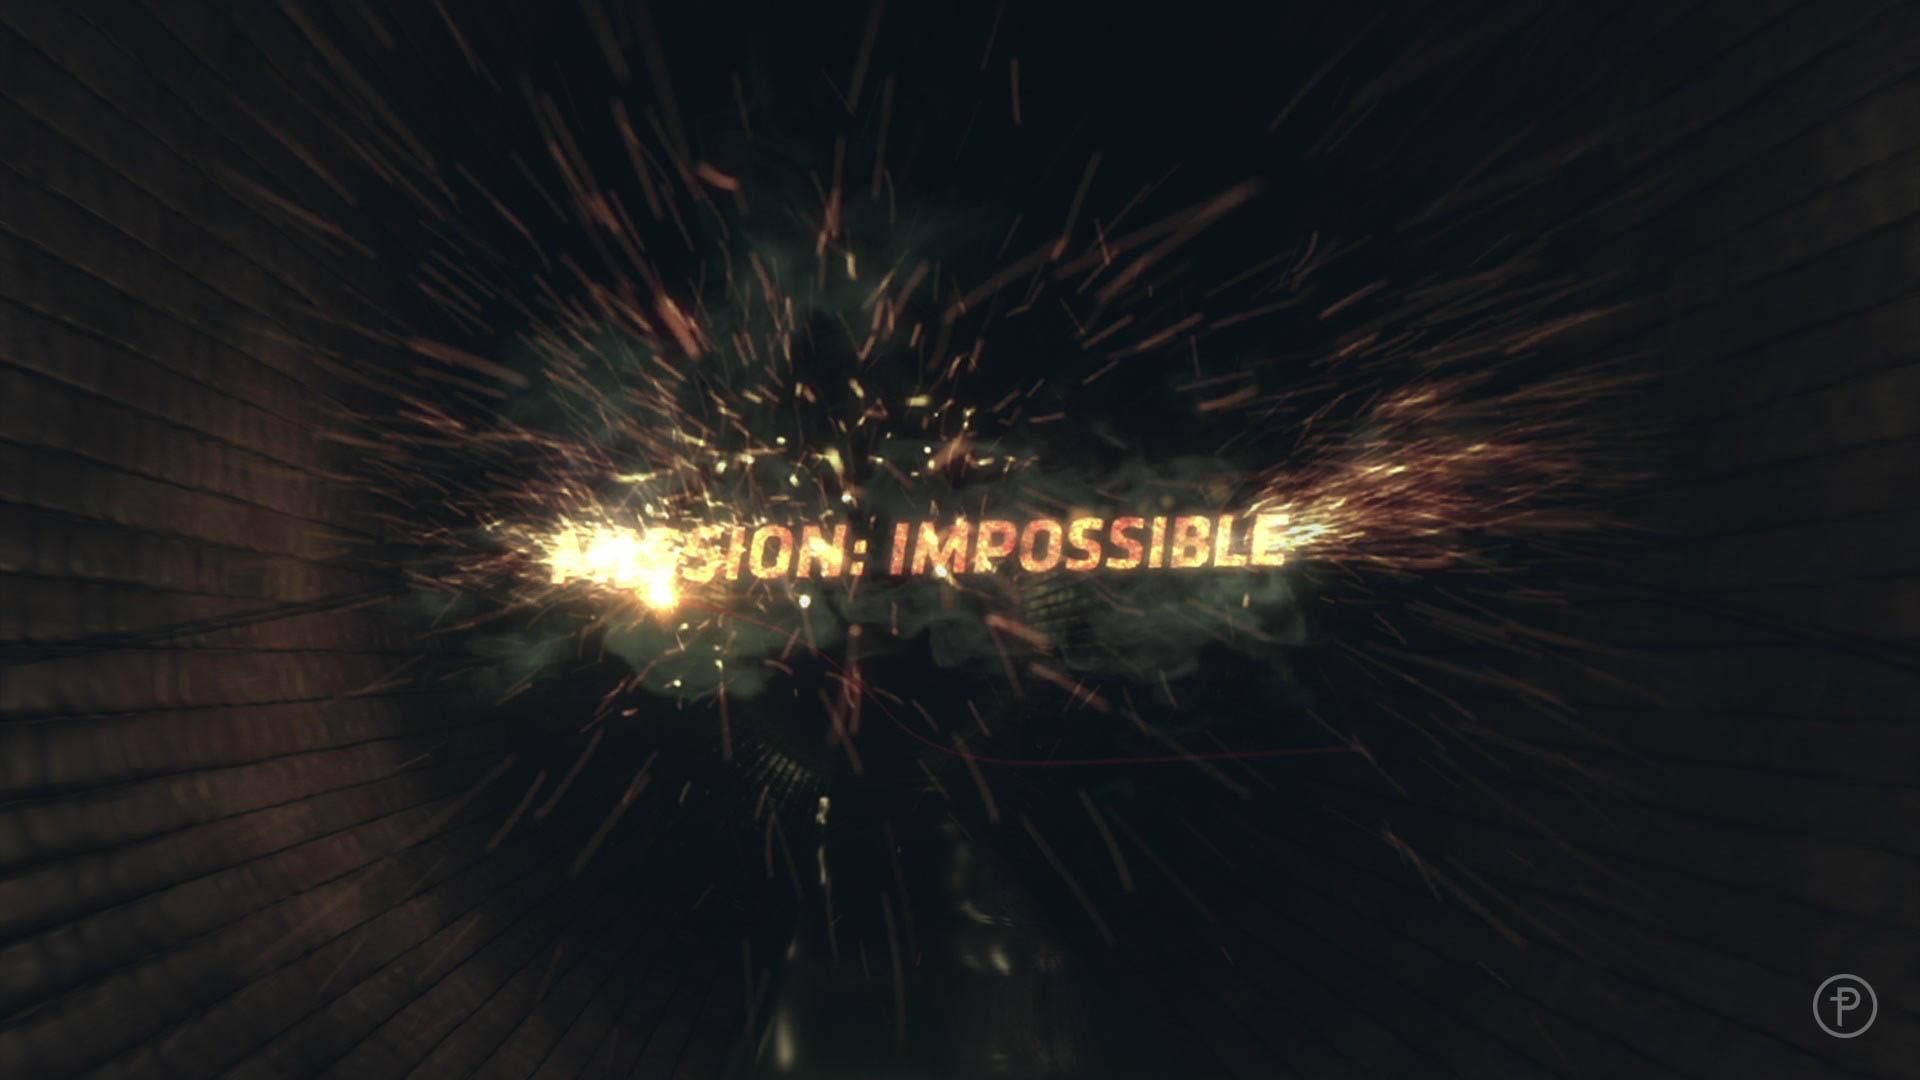 Zai_Ortiz_MISSION_IMPOSSIBLE_-8.jpg